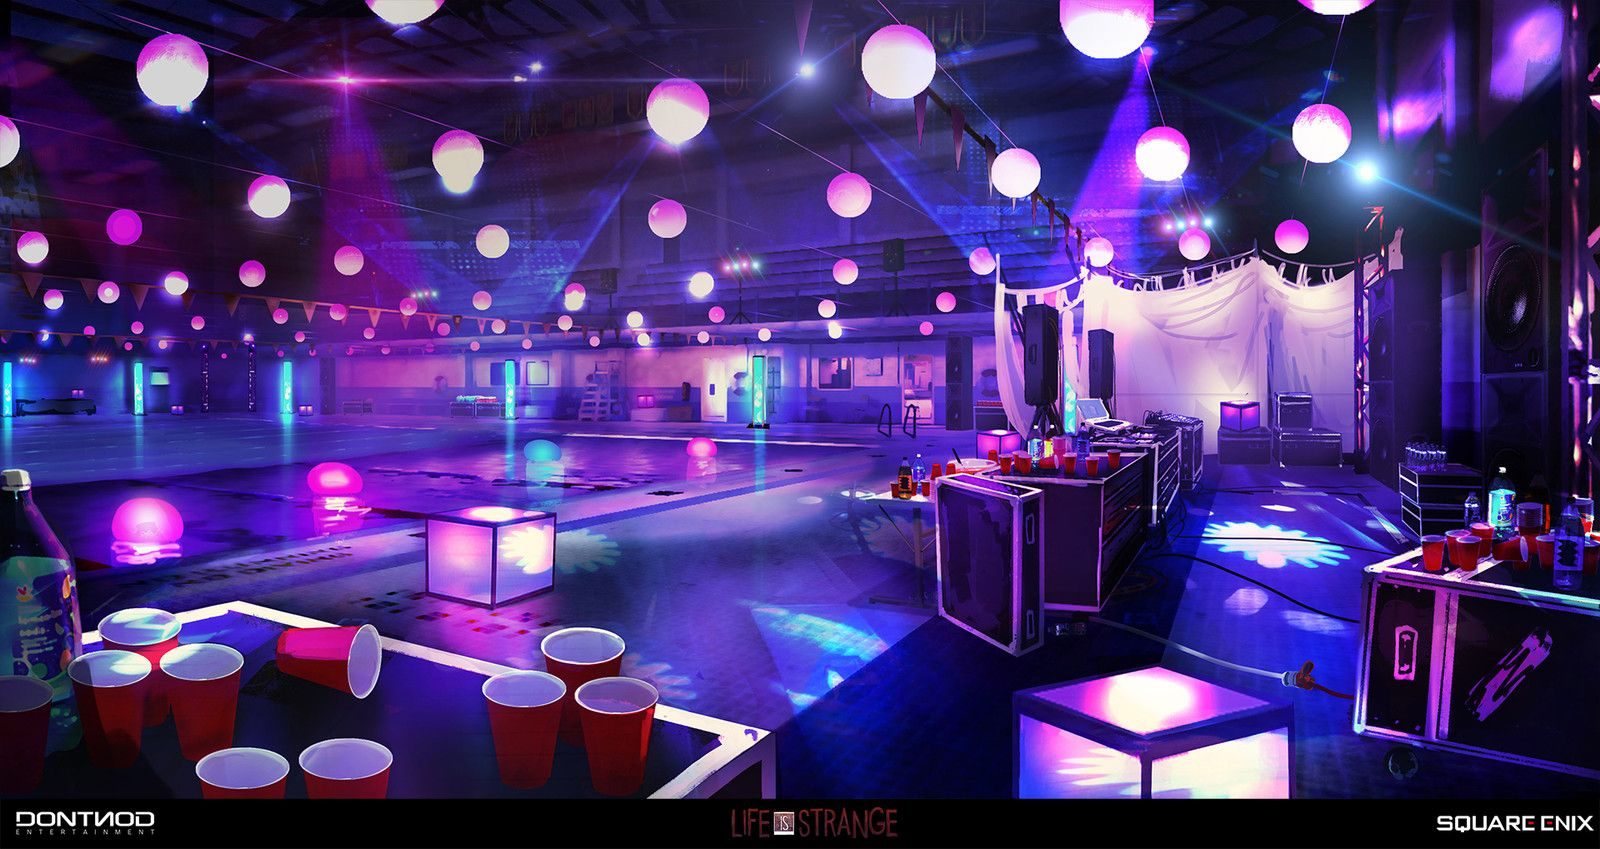 Pool Party vortex club - Life Is Strange, Gary jamroz-palma